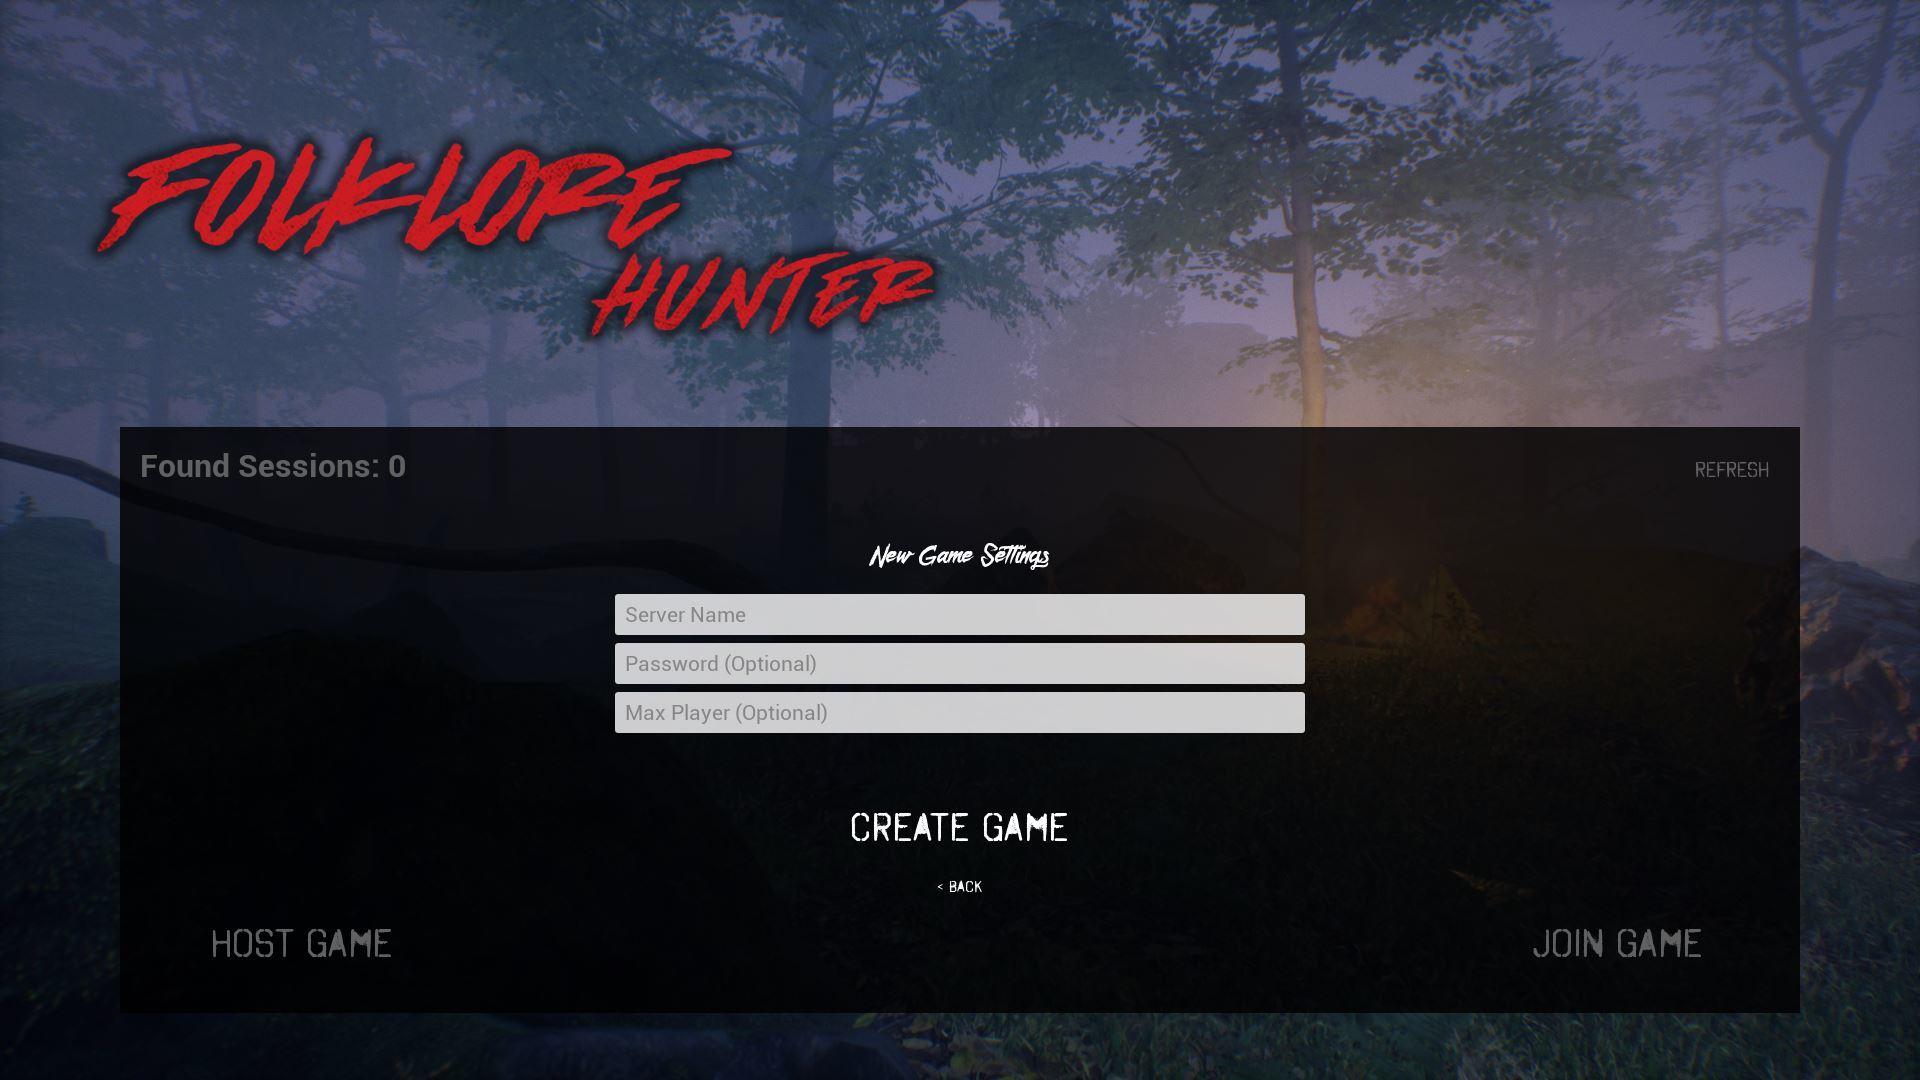 Folklore Hunter Full Comprehensive Guide Steamah